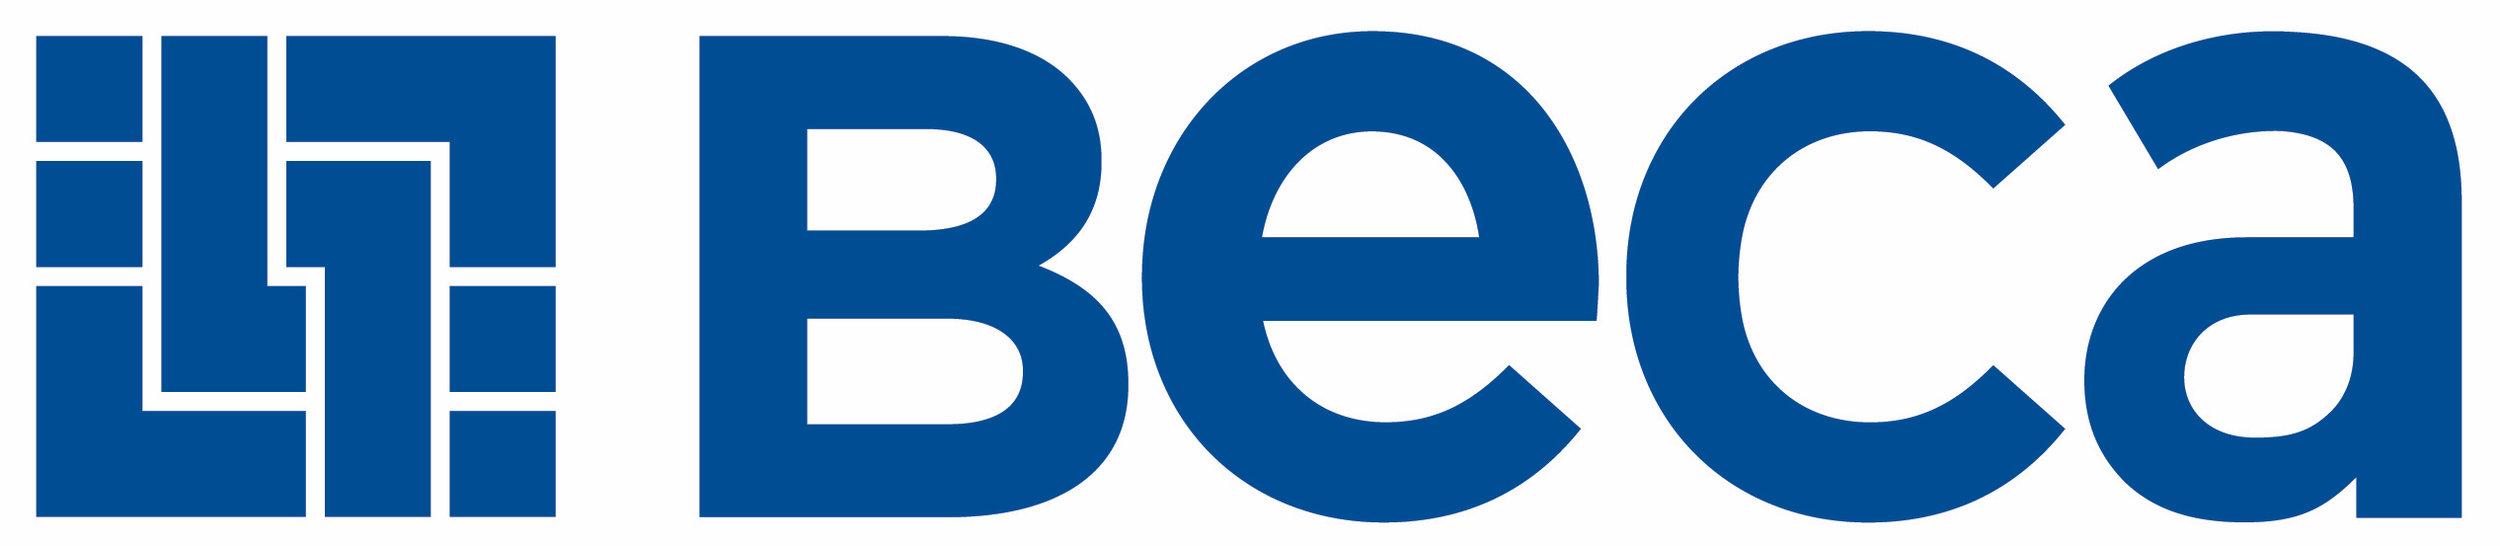 Beca logo.jpg